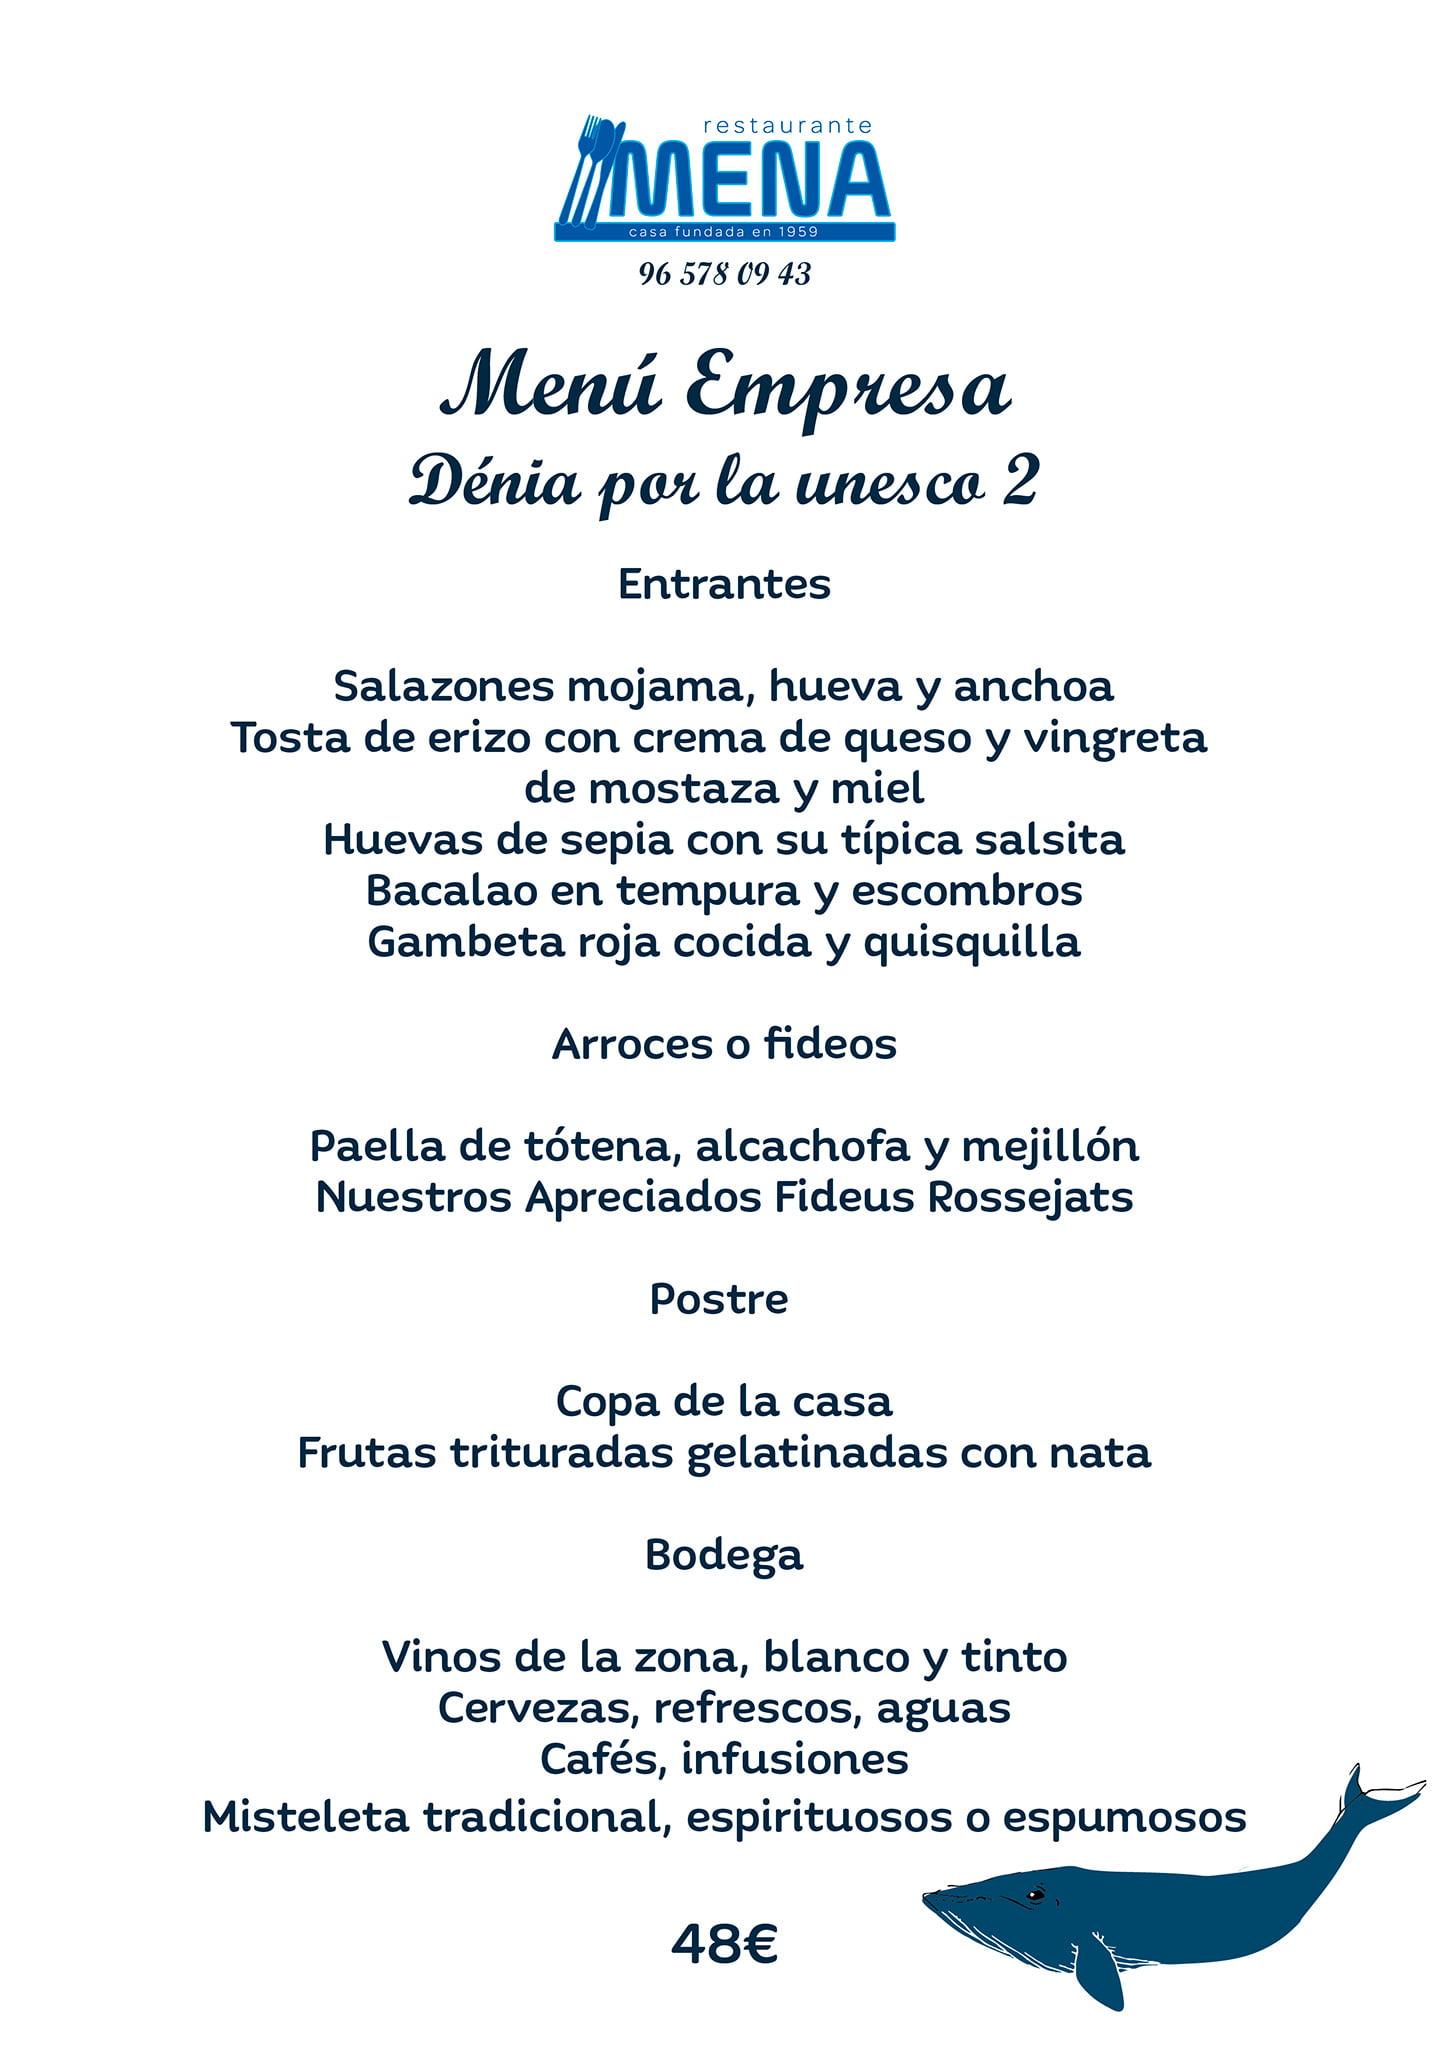 menu-de-empresa-unesco-2-restaurante-mena